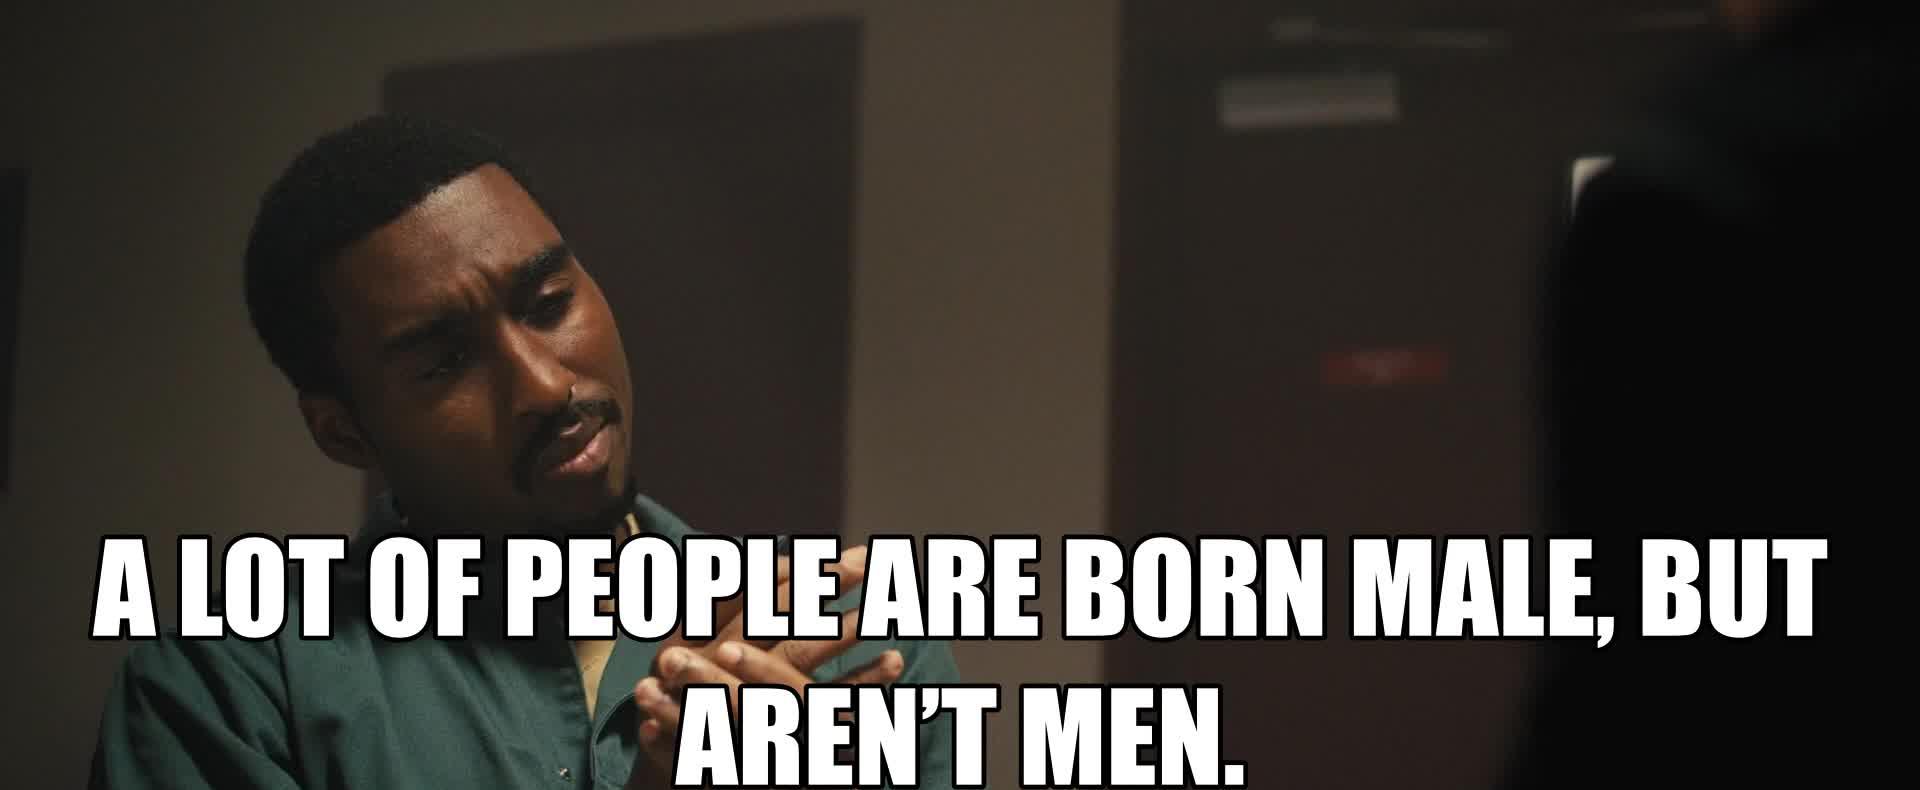 2pac, All Eyez On Me, AllEyezOnMe, Lionsgate, Tupac, movie, I'm a man GIFs